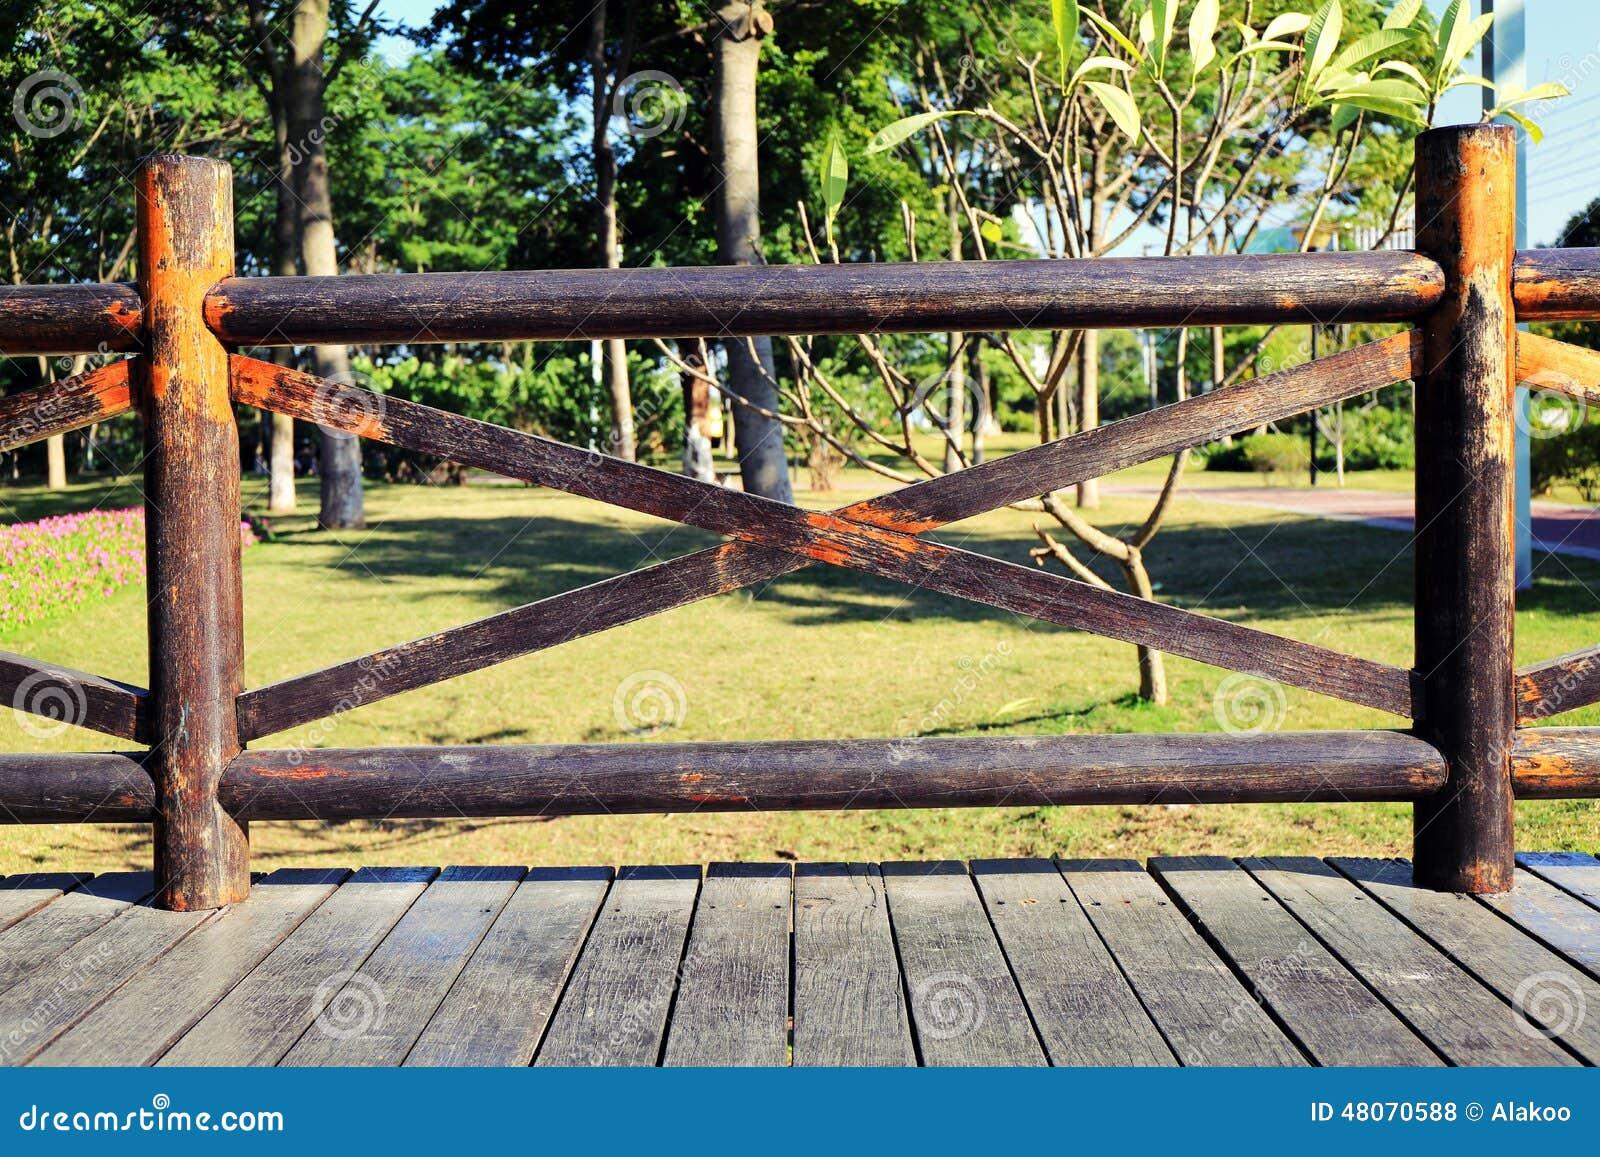 Wooden balustrade wood deck